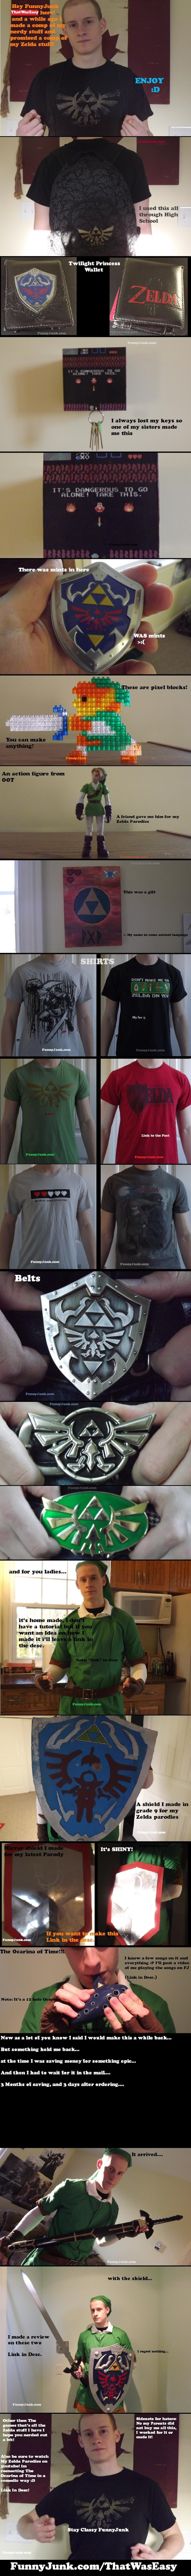 Zelda Comp!. Ocarina Playing>> funnyjunk.com/movies/3332899/Ocarina+Skills/ Parts of Costume>> (skip to 5:52)>> youtube.com/watch?v=wma8In7pQv